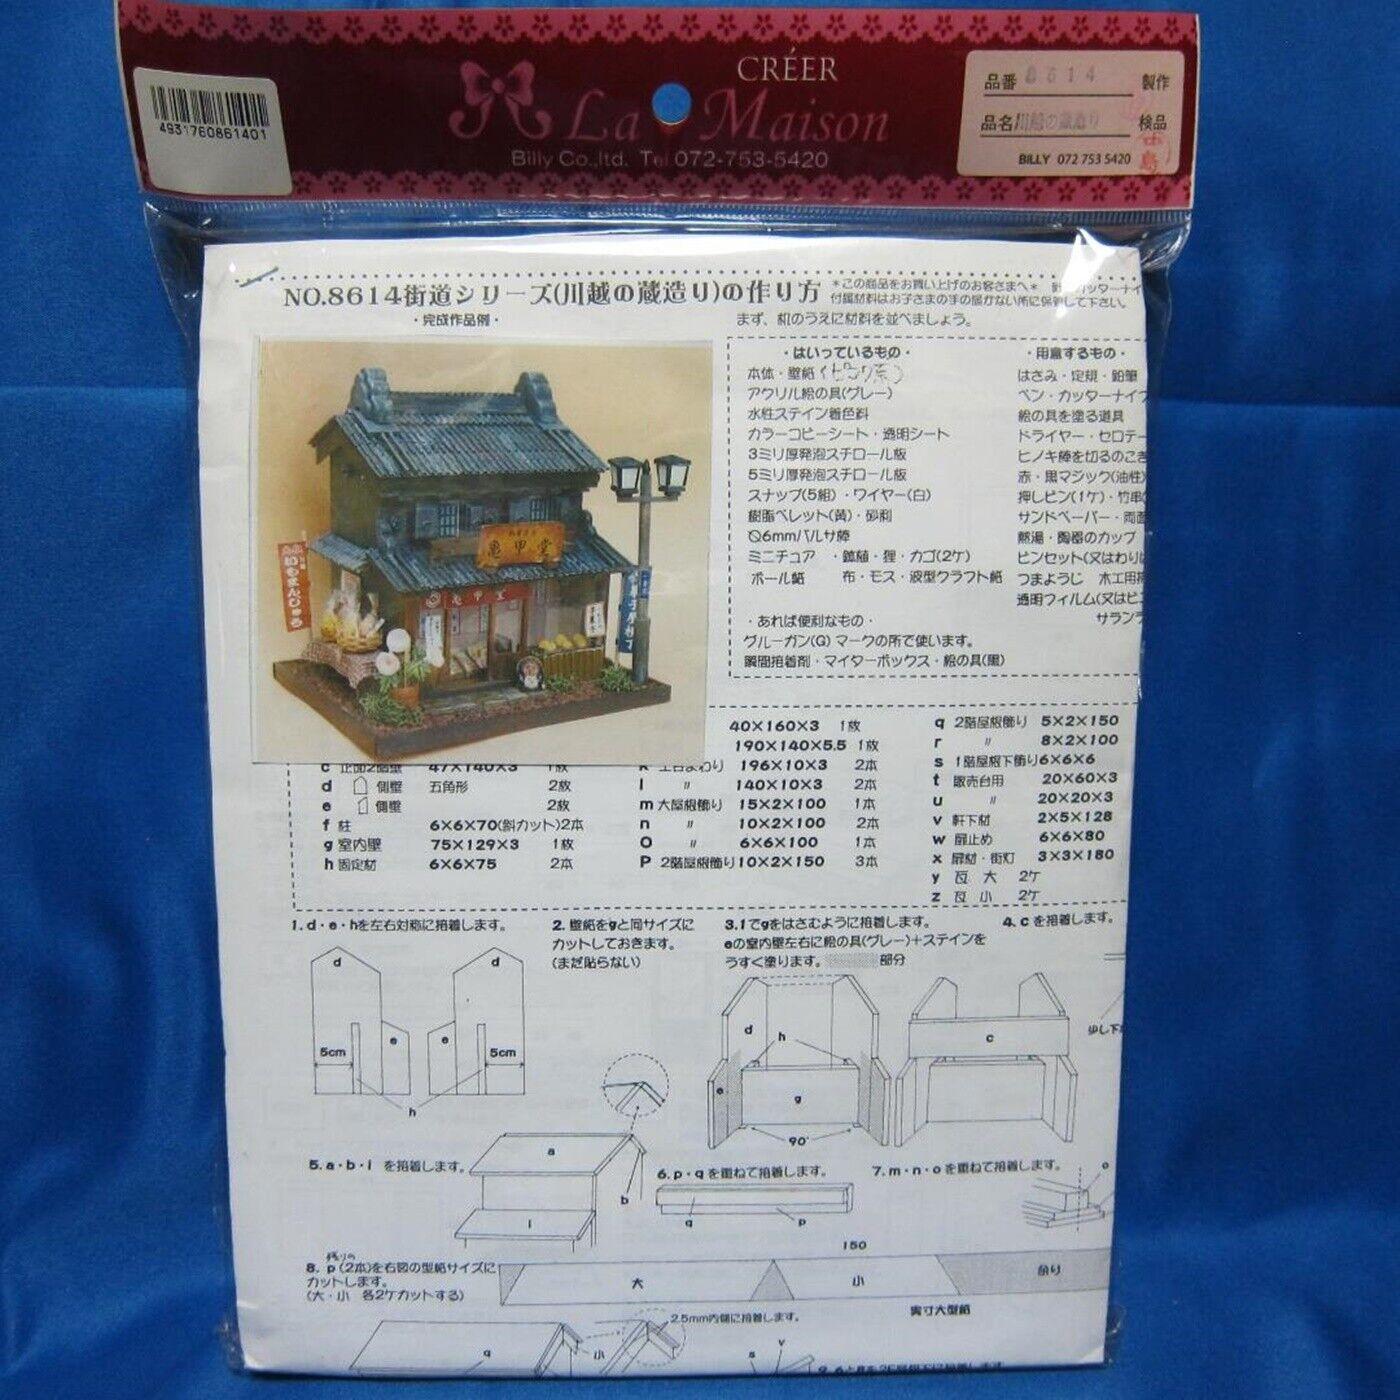 marcas en línea venta barata Billy Hecho a Mano Muñeca Casa Kit nostalgia Kawagoe's Kawagoe's Kawagoe's Collection edificio 8614 F S  barato y de alta calidad